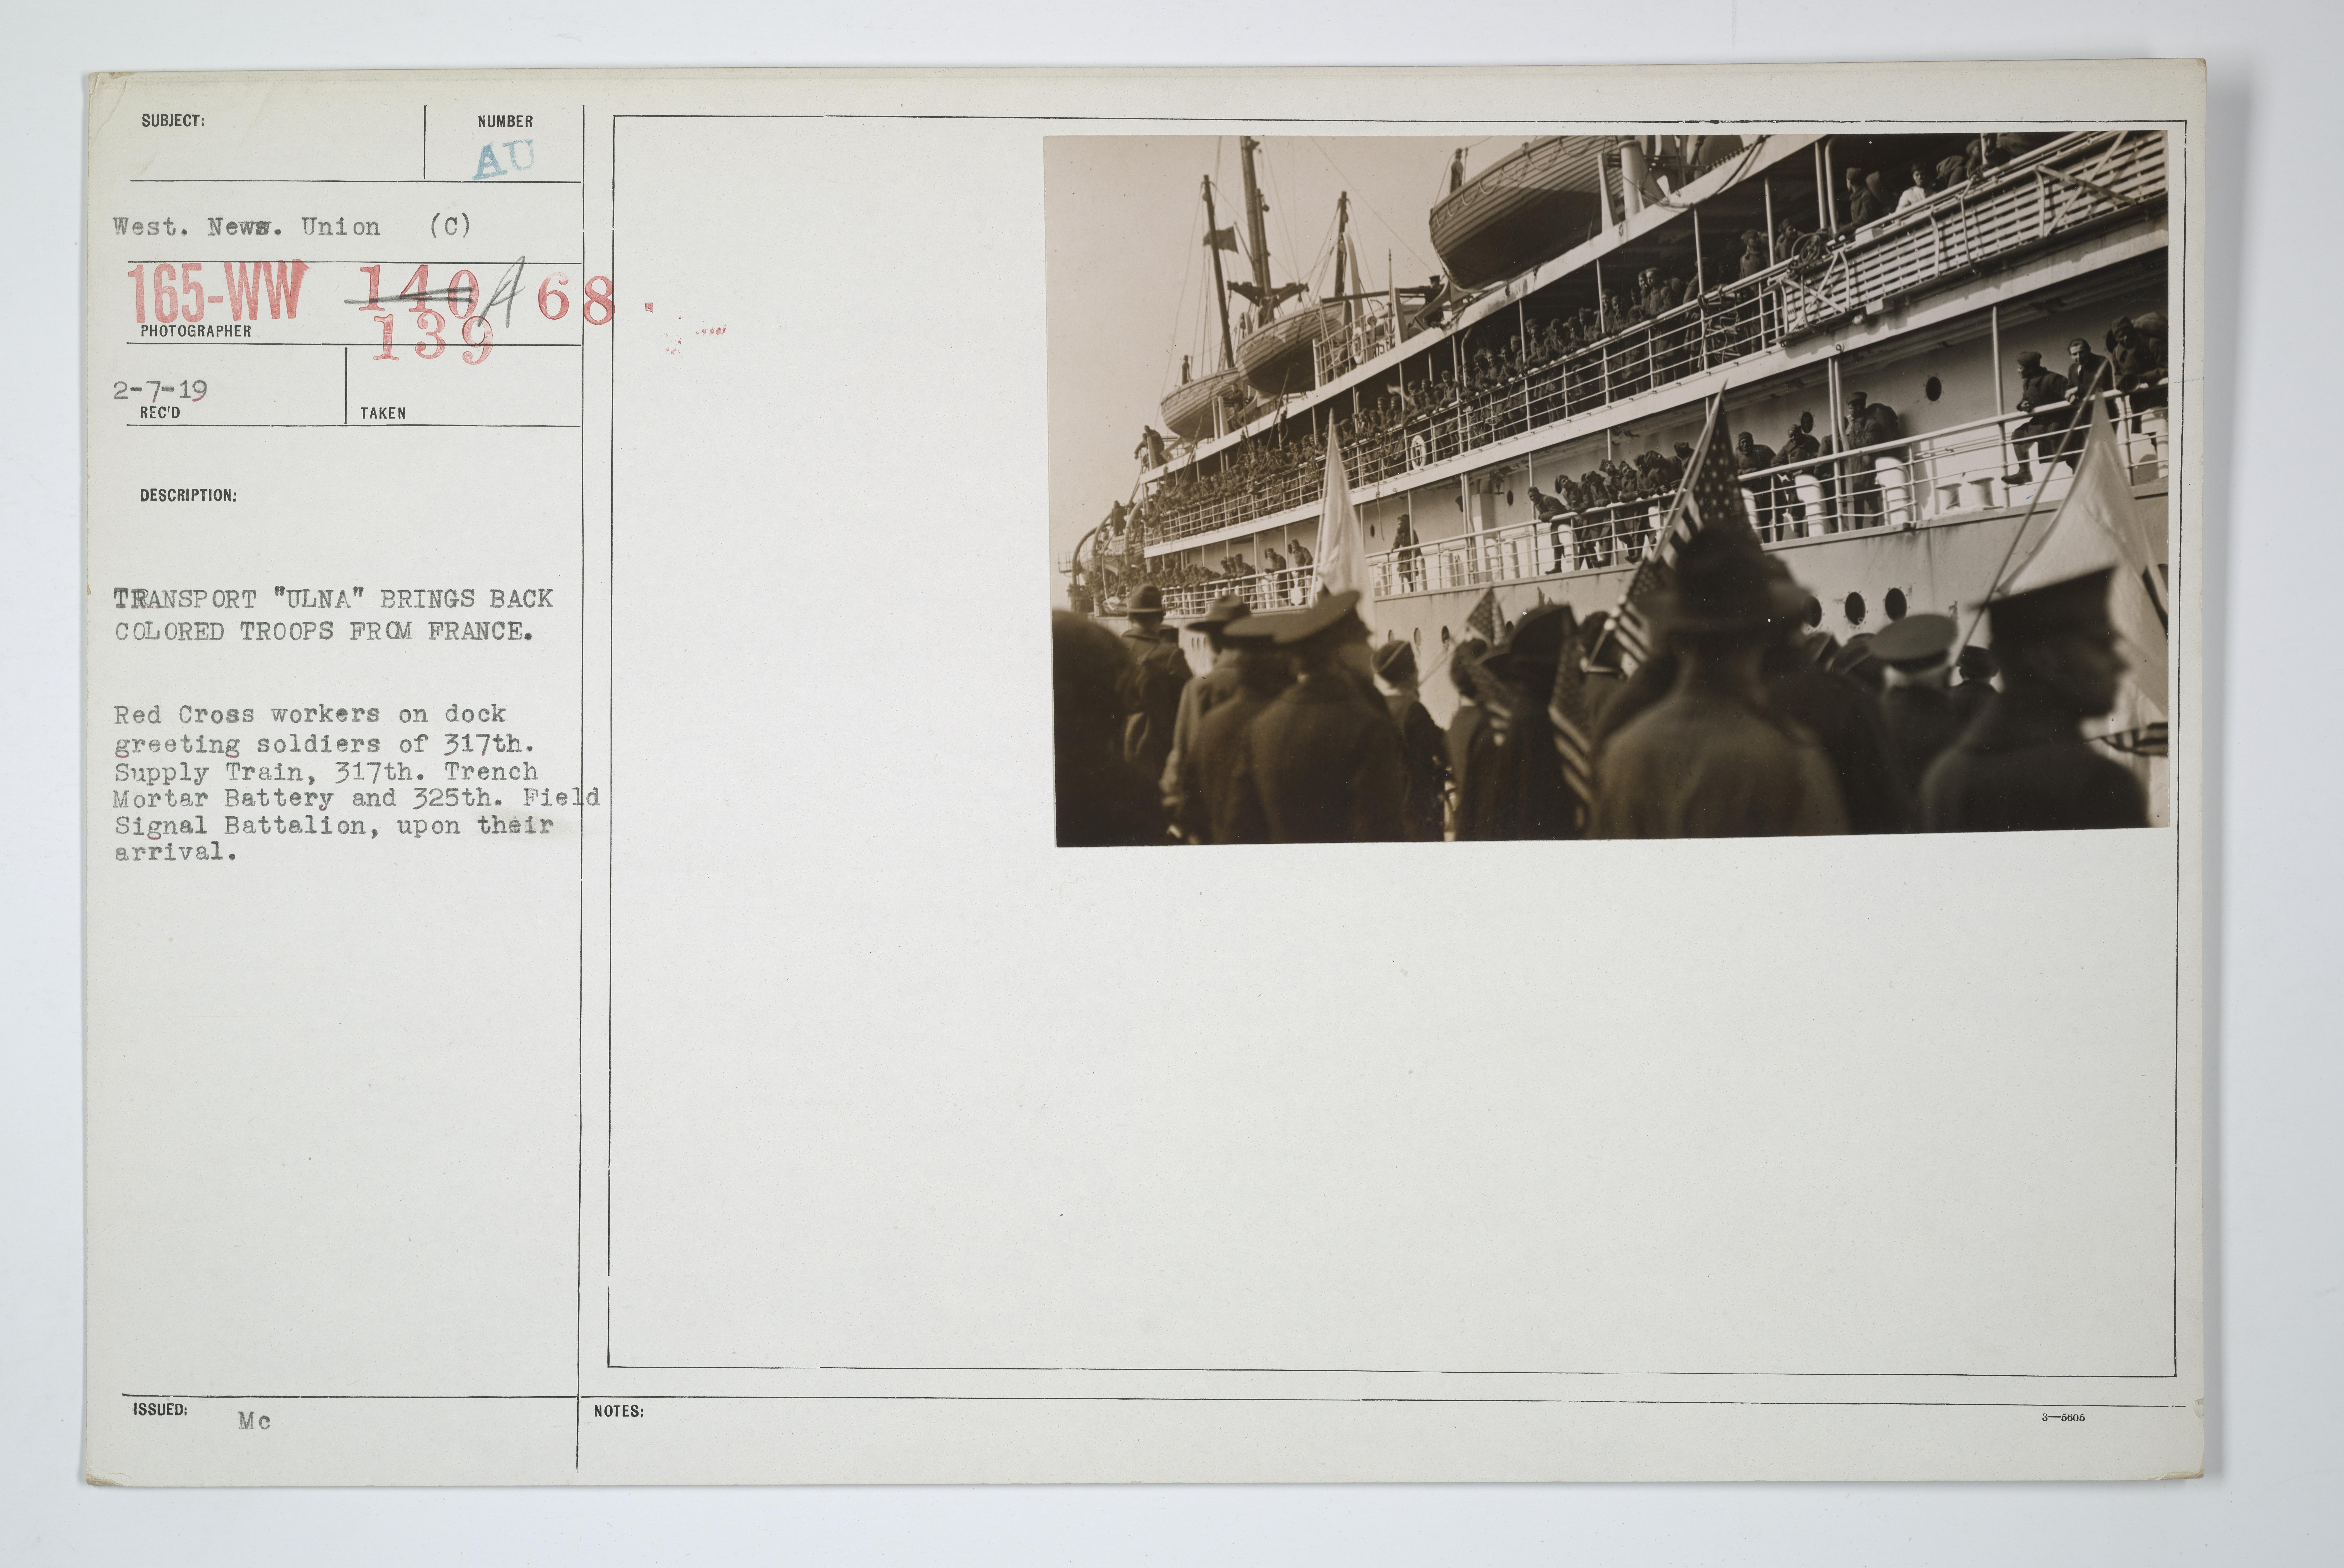 file demobilization arrivals home transport of ulna brings back rh commons wikimedia org